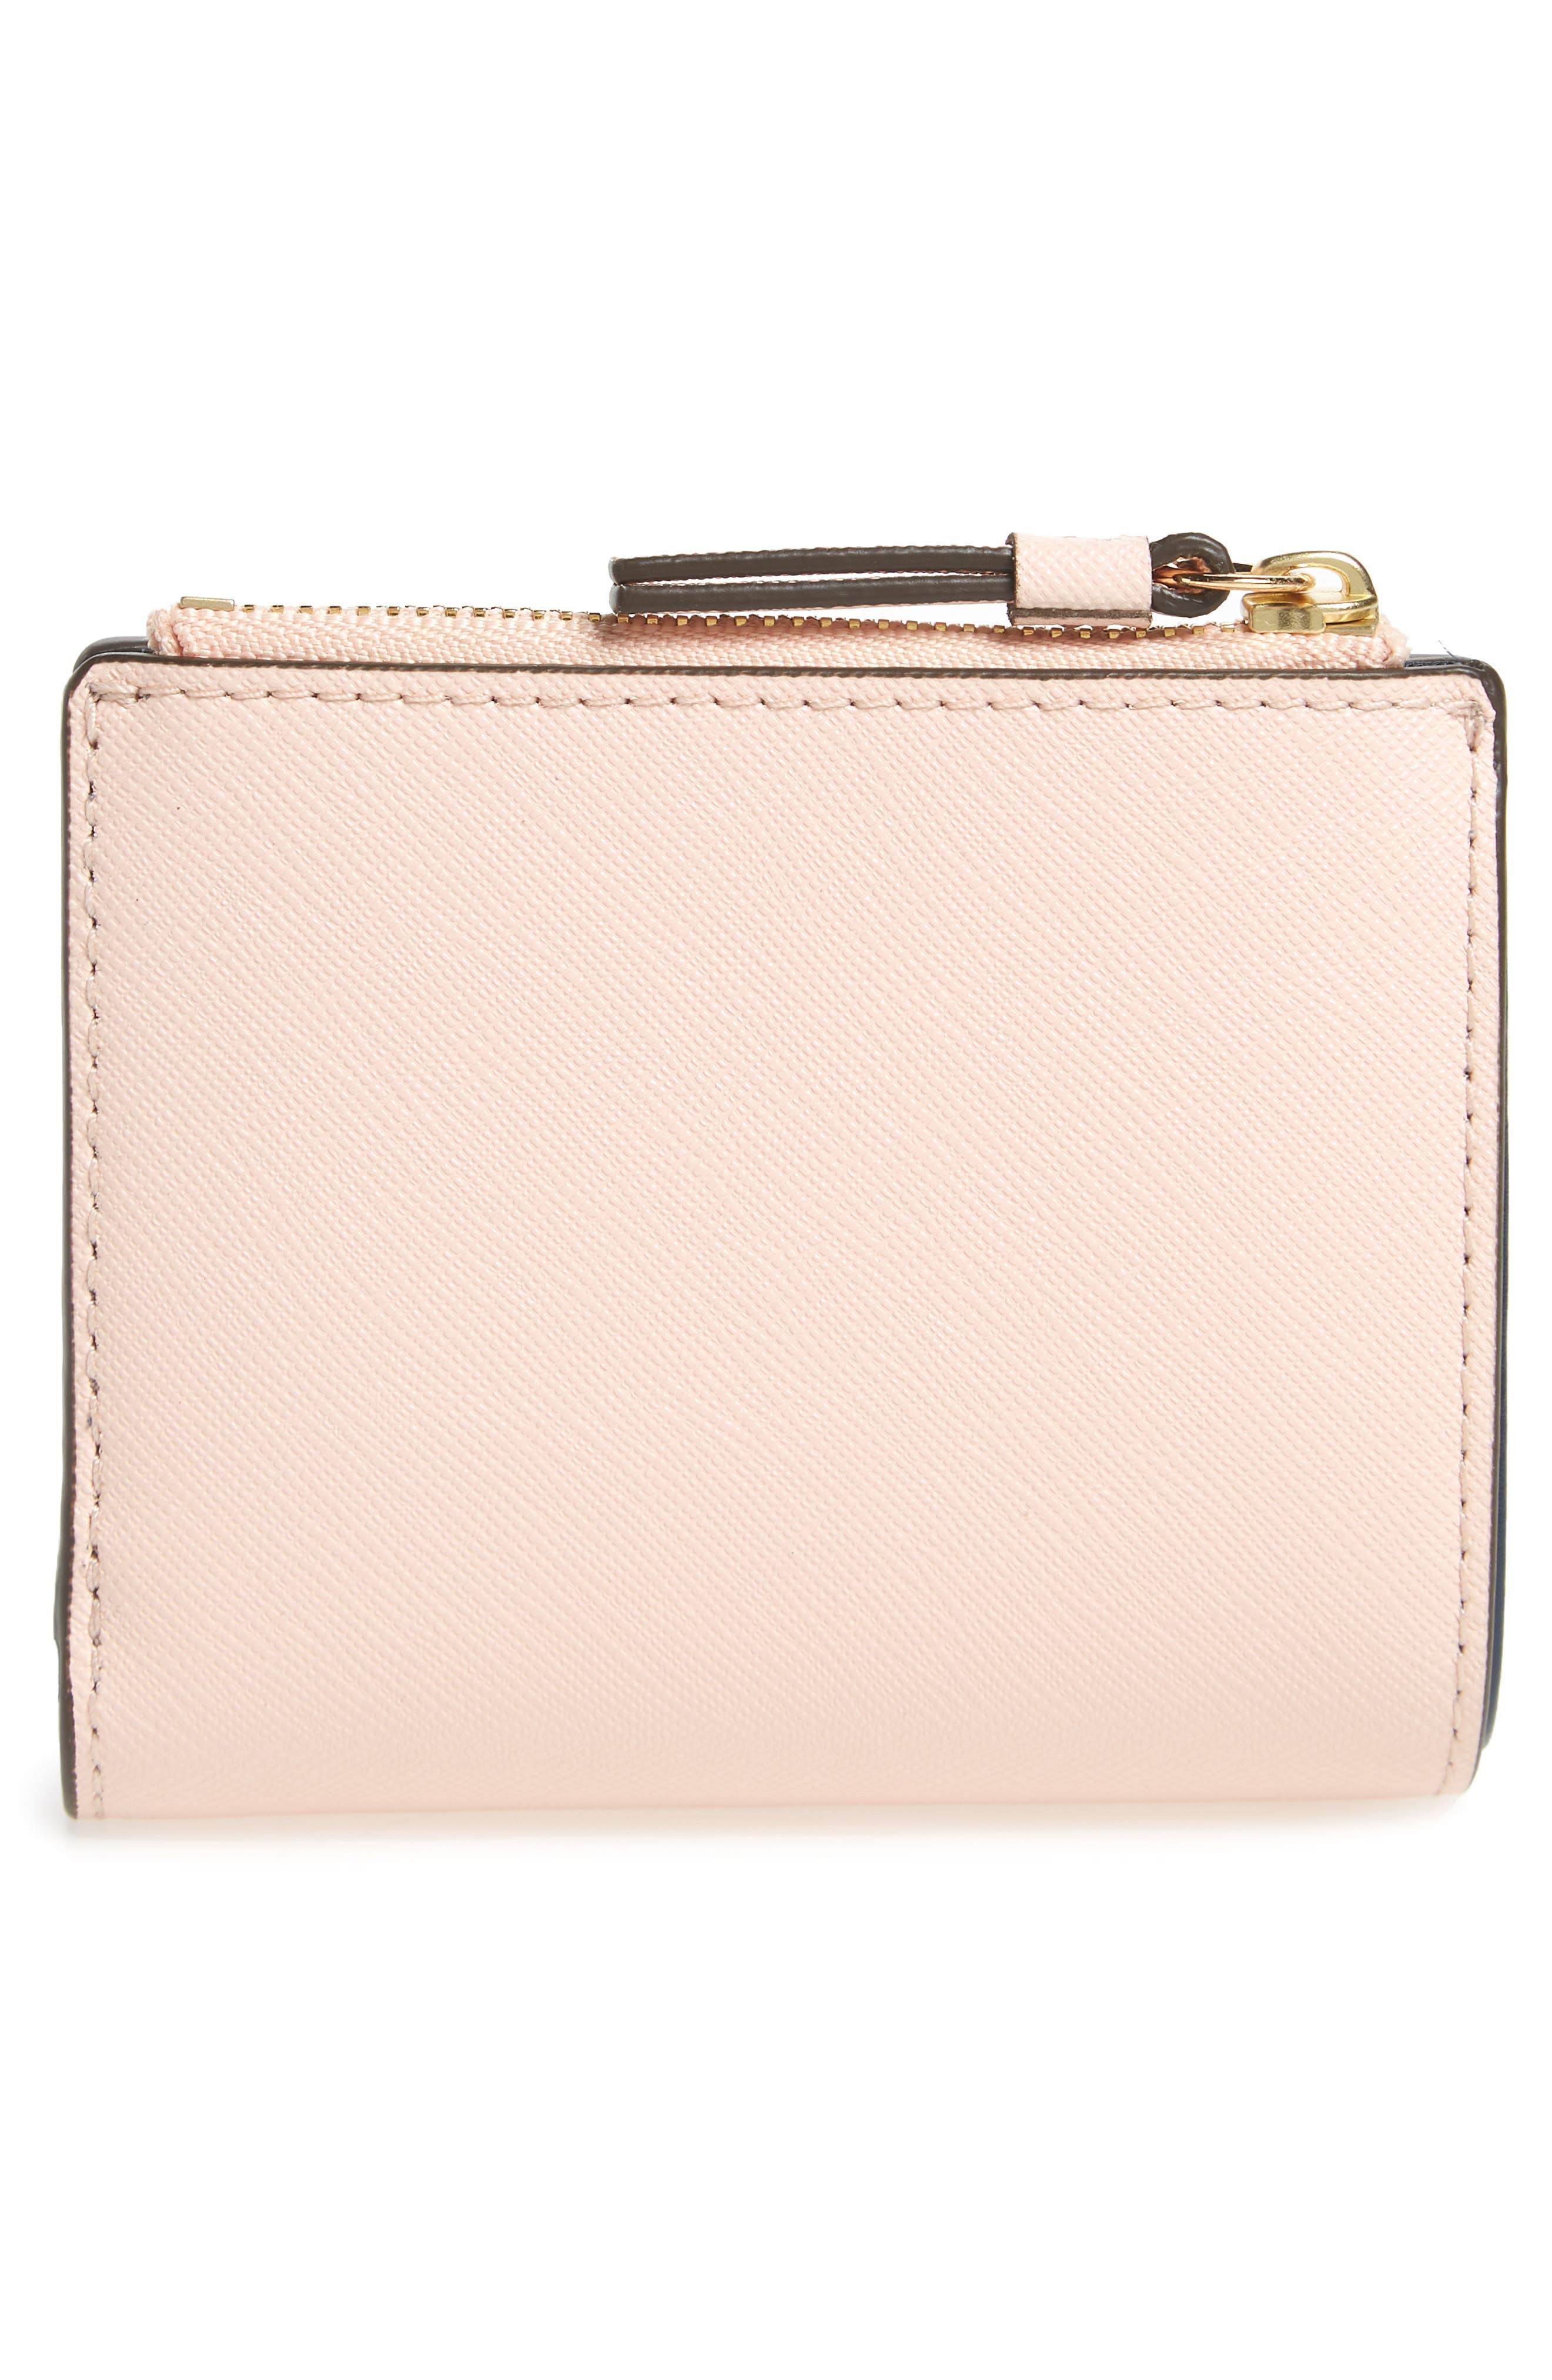 Mini Robinson Wallet Leather Bifold Wallet,                             Alternate thumbnail 4, color,                             Pale Apricot / Royal Navy